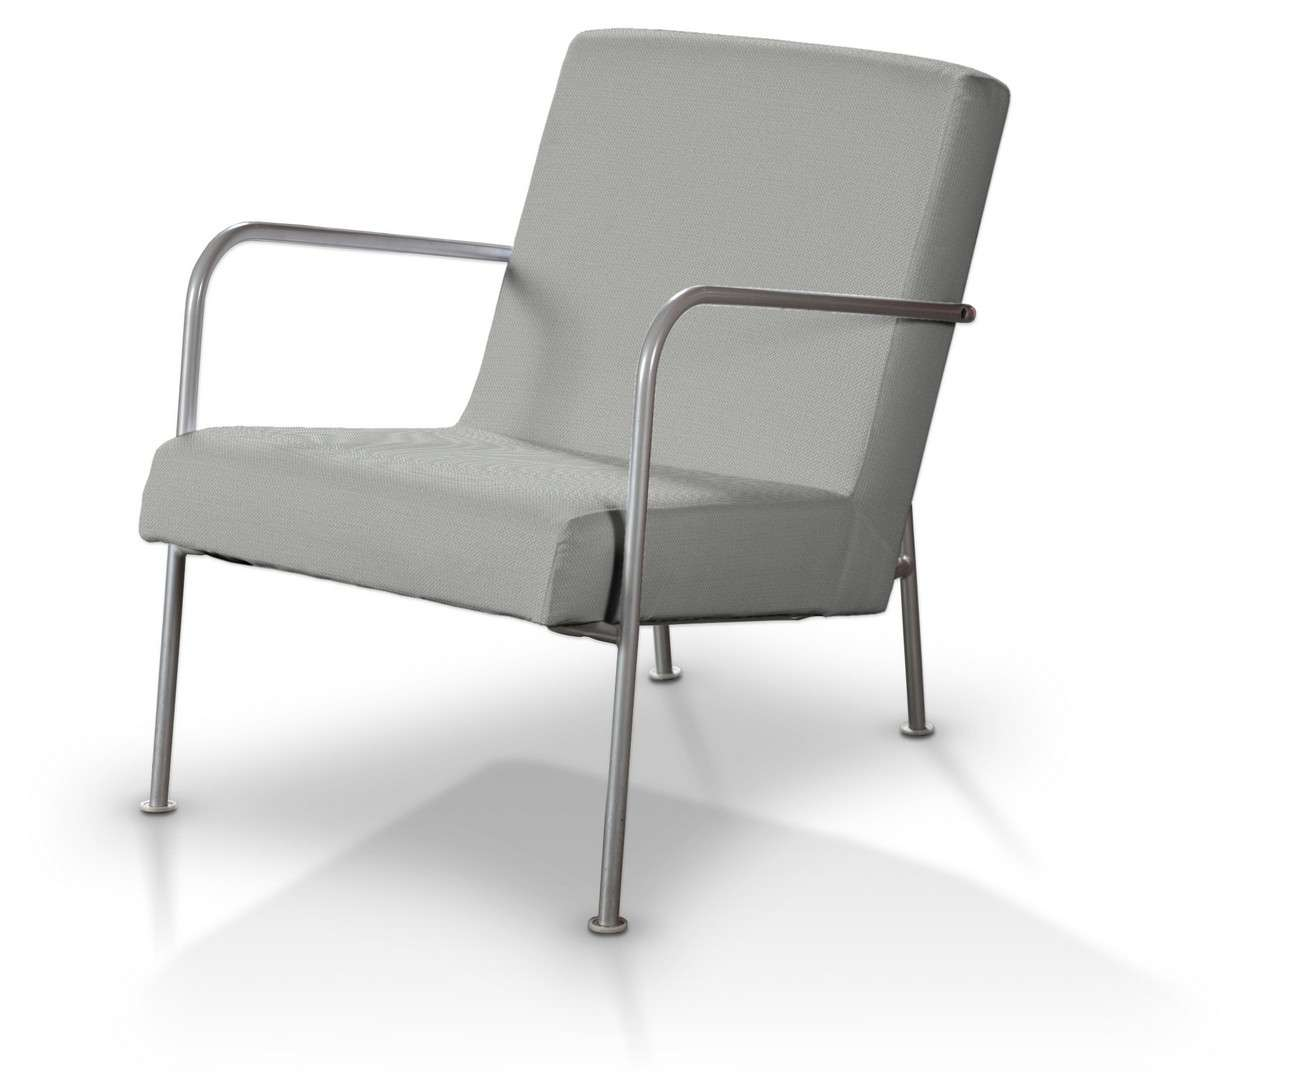 Pokrowiec na fotel Ikea PS w kolekcji Bergen, tkanina: 161-72